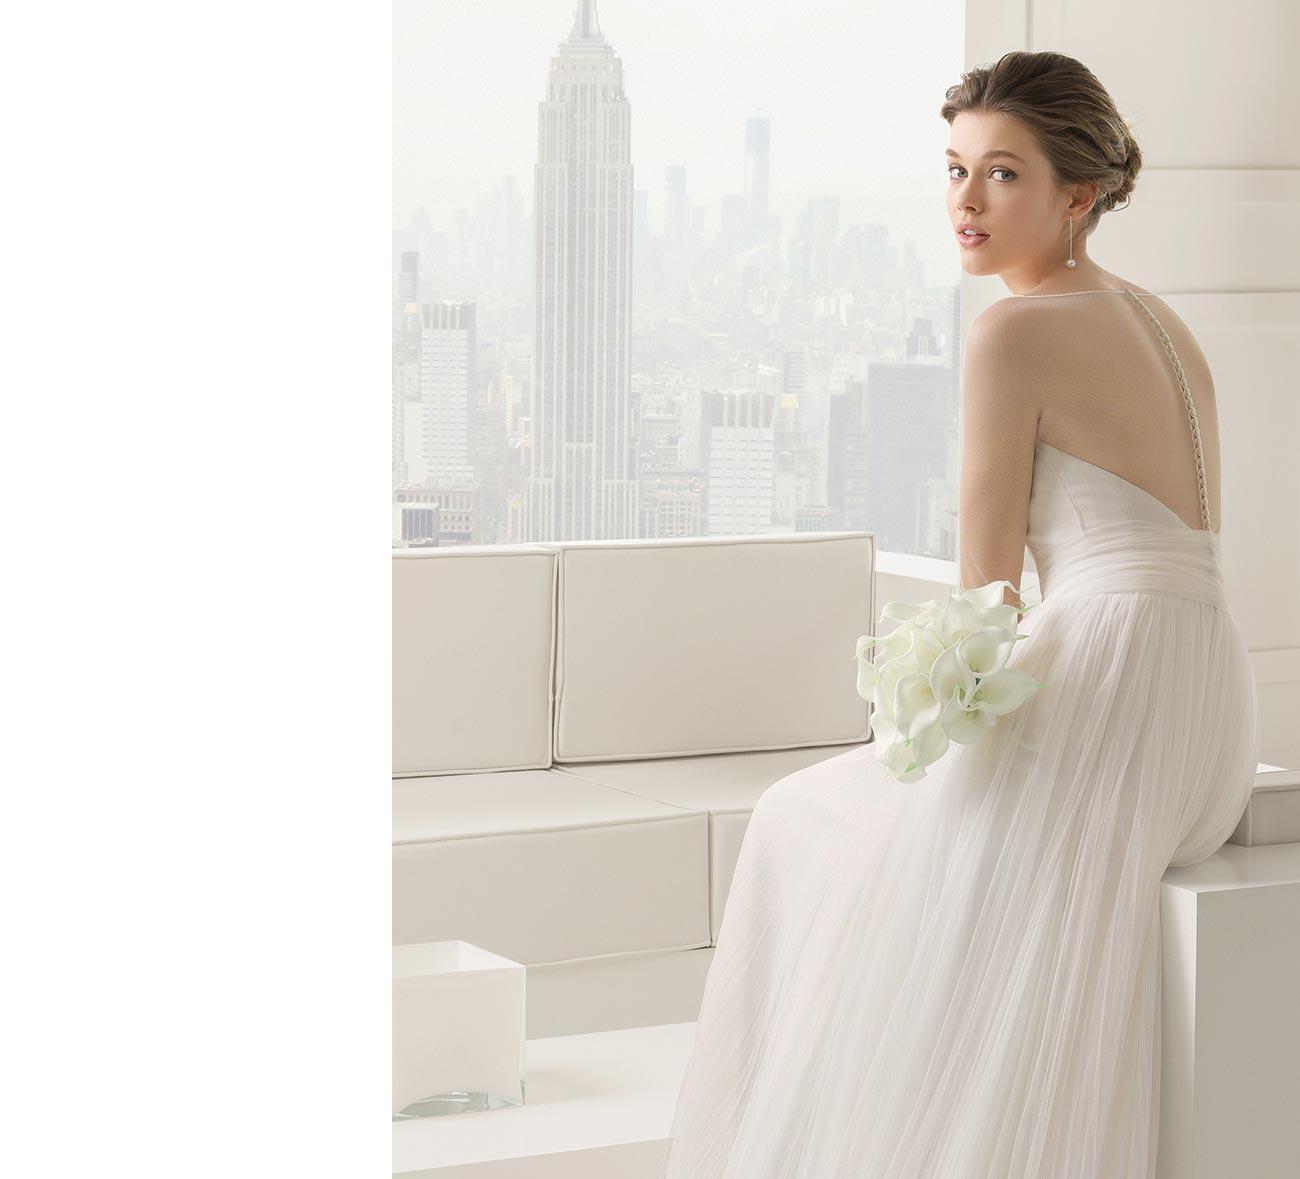 72a4dcc631e7 Wedding Planner Personal Assistent - Patrizia Spose